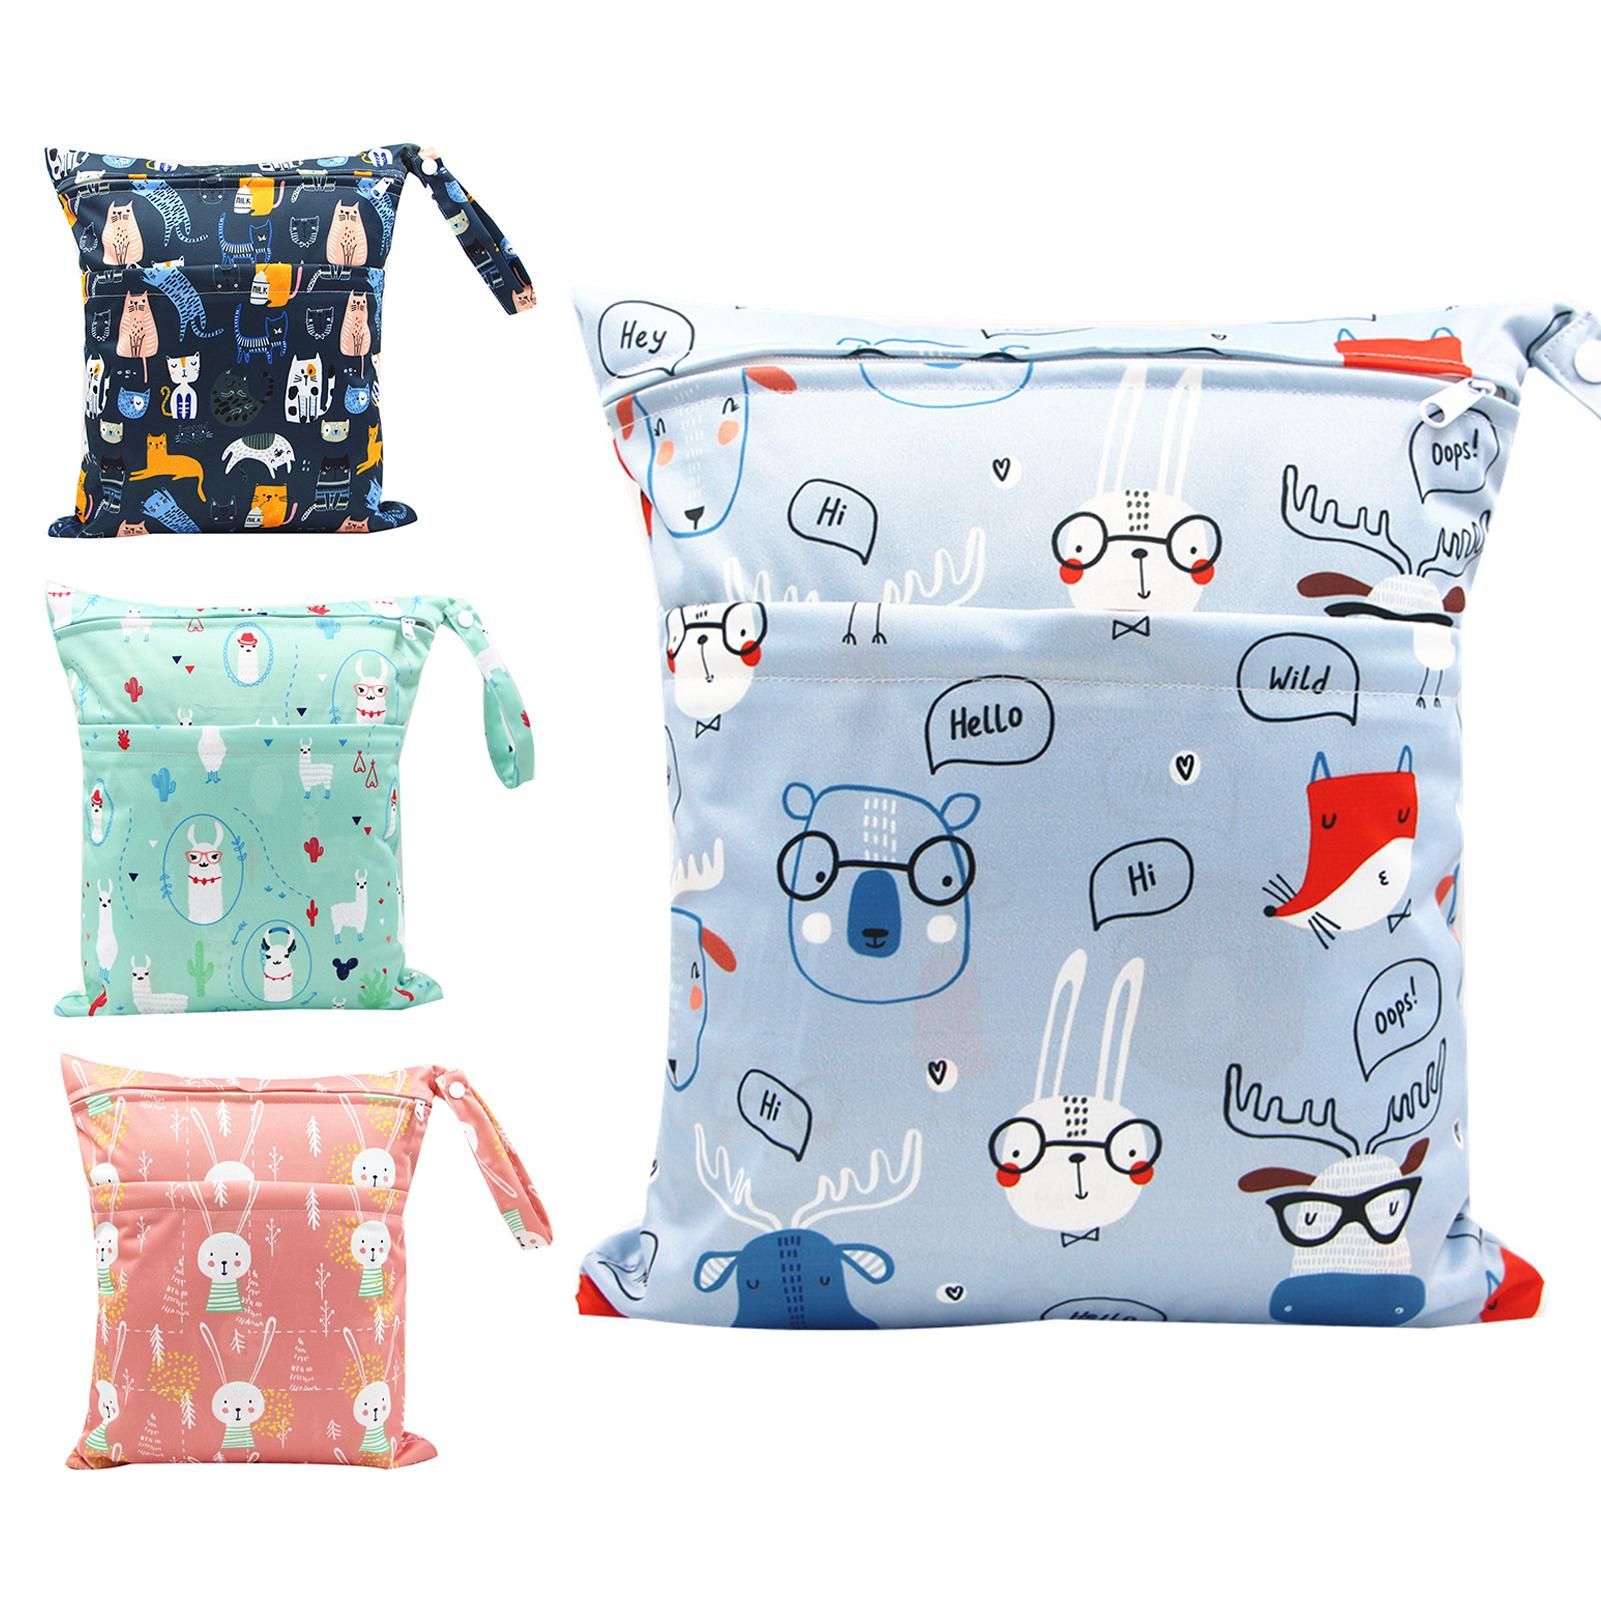 Newborn Convenient Practical Stylish Multi-occasional Portable Waterproof Diaper Bag Double Zipper Cartoon Printing Storage Pouc